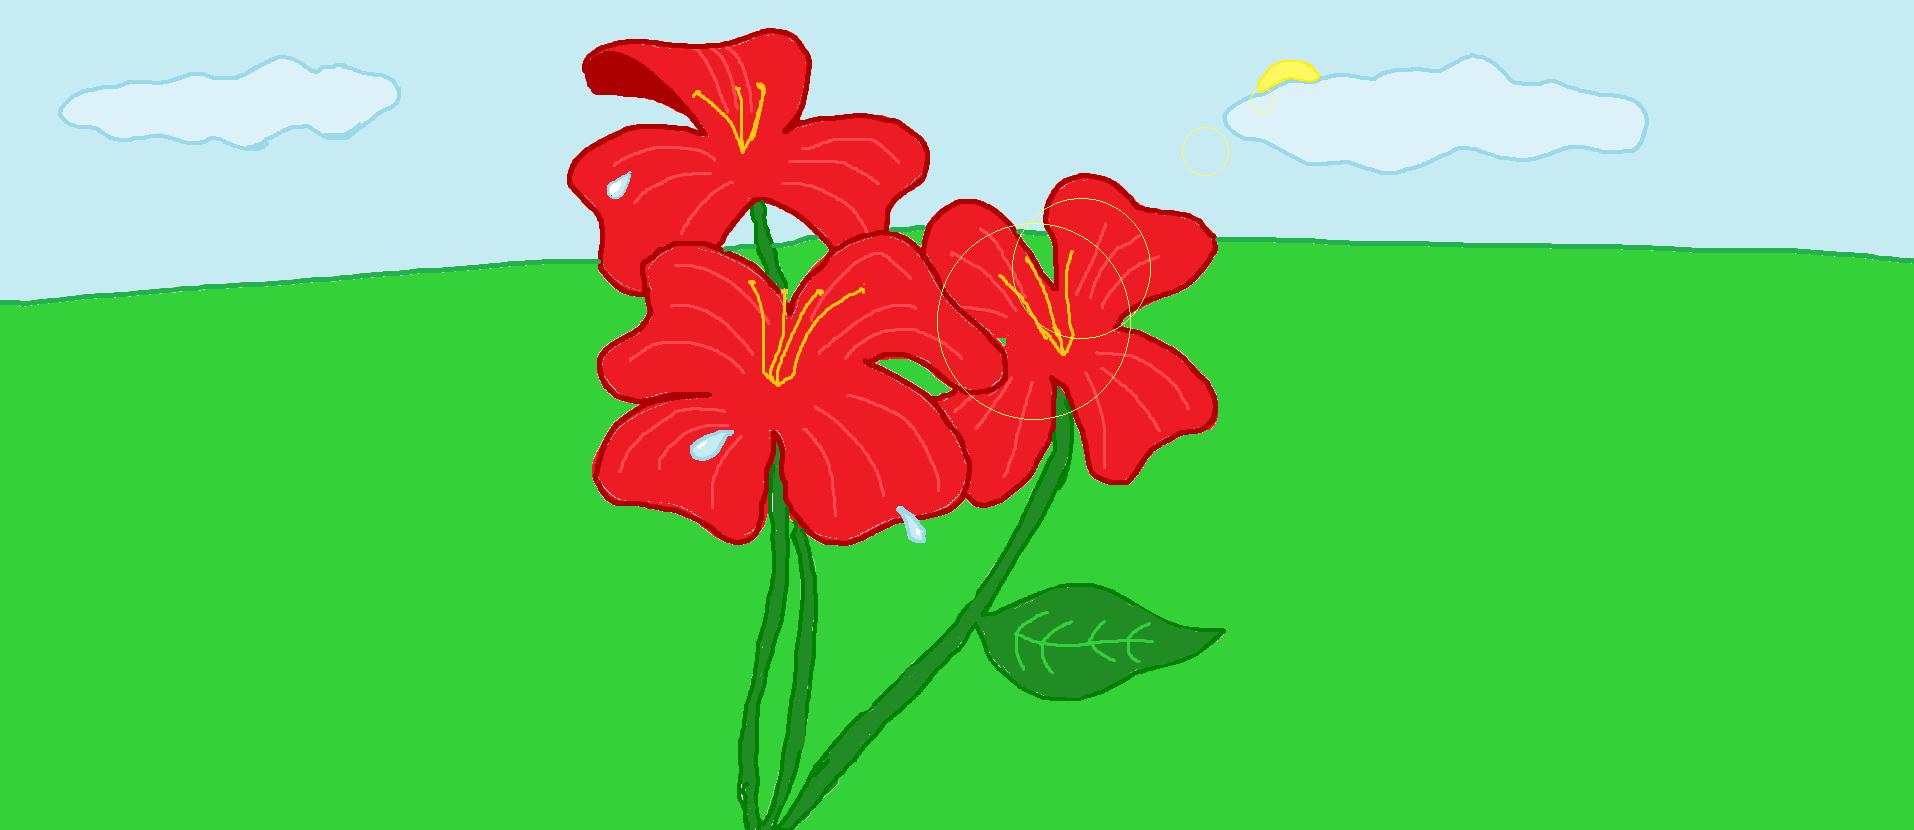 Red Mellows